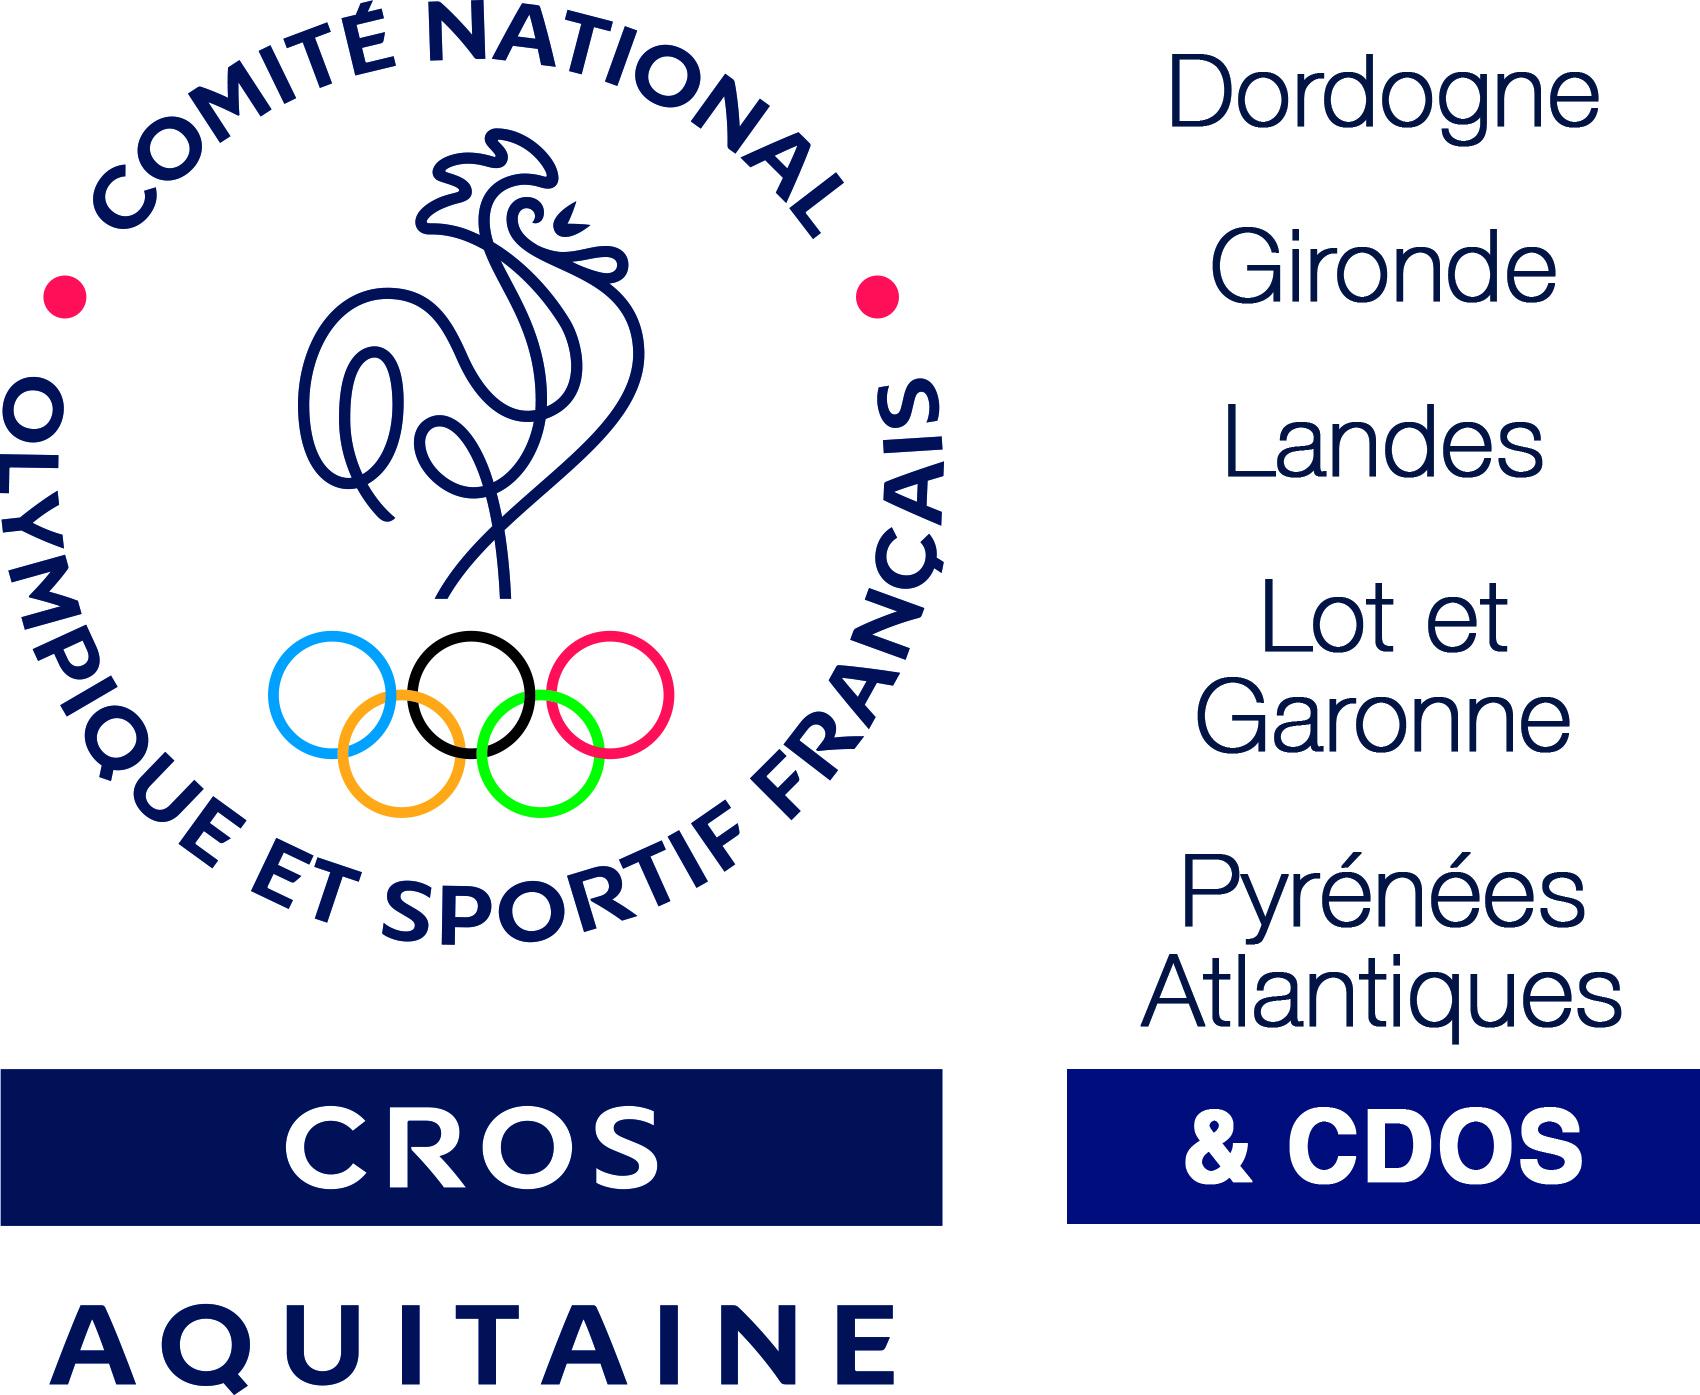 CROS Nouvelle Aquitaine